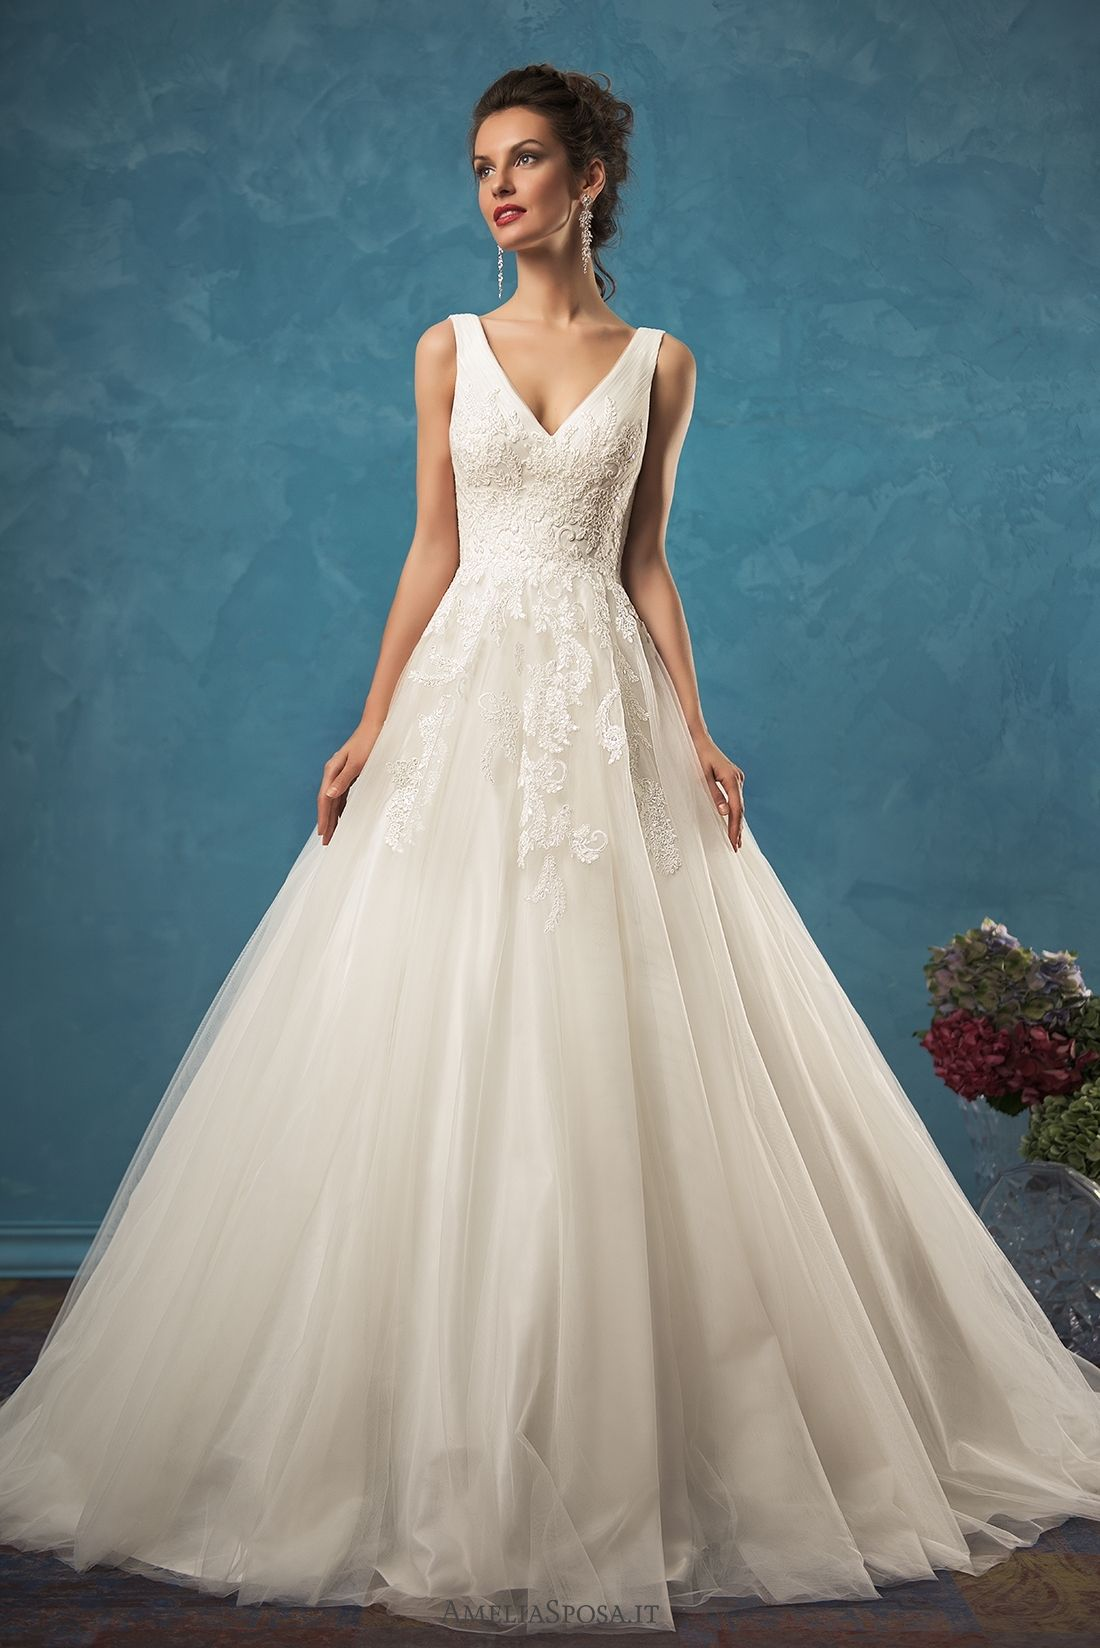 Charmant Vestidos De Novia De Vera Wang Fotos - Hochzeit Kleid Stile ...